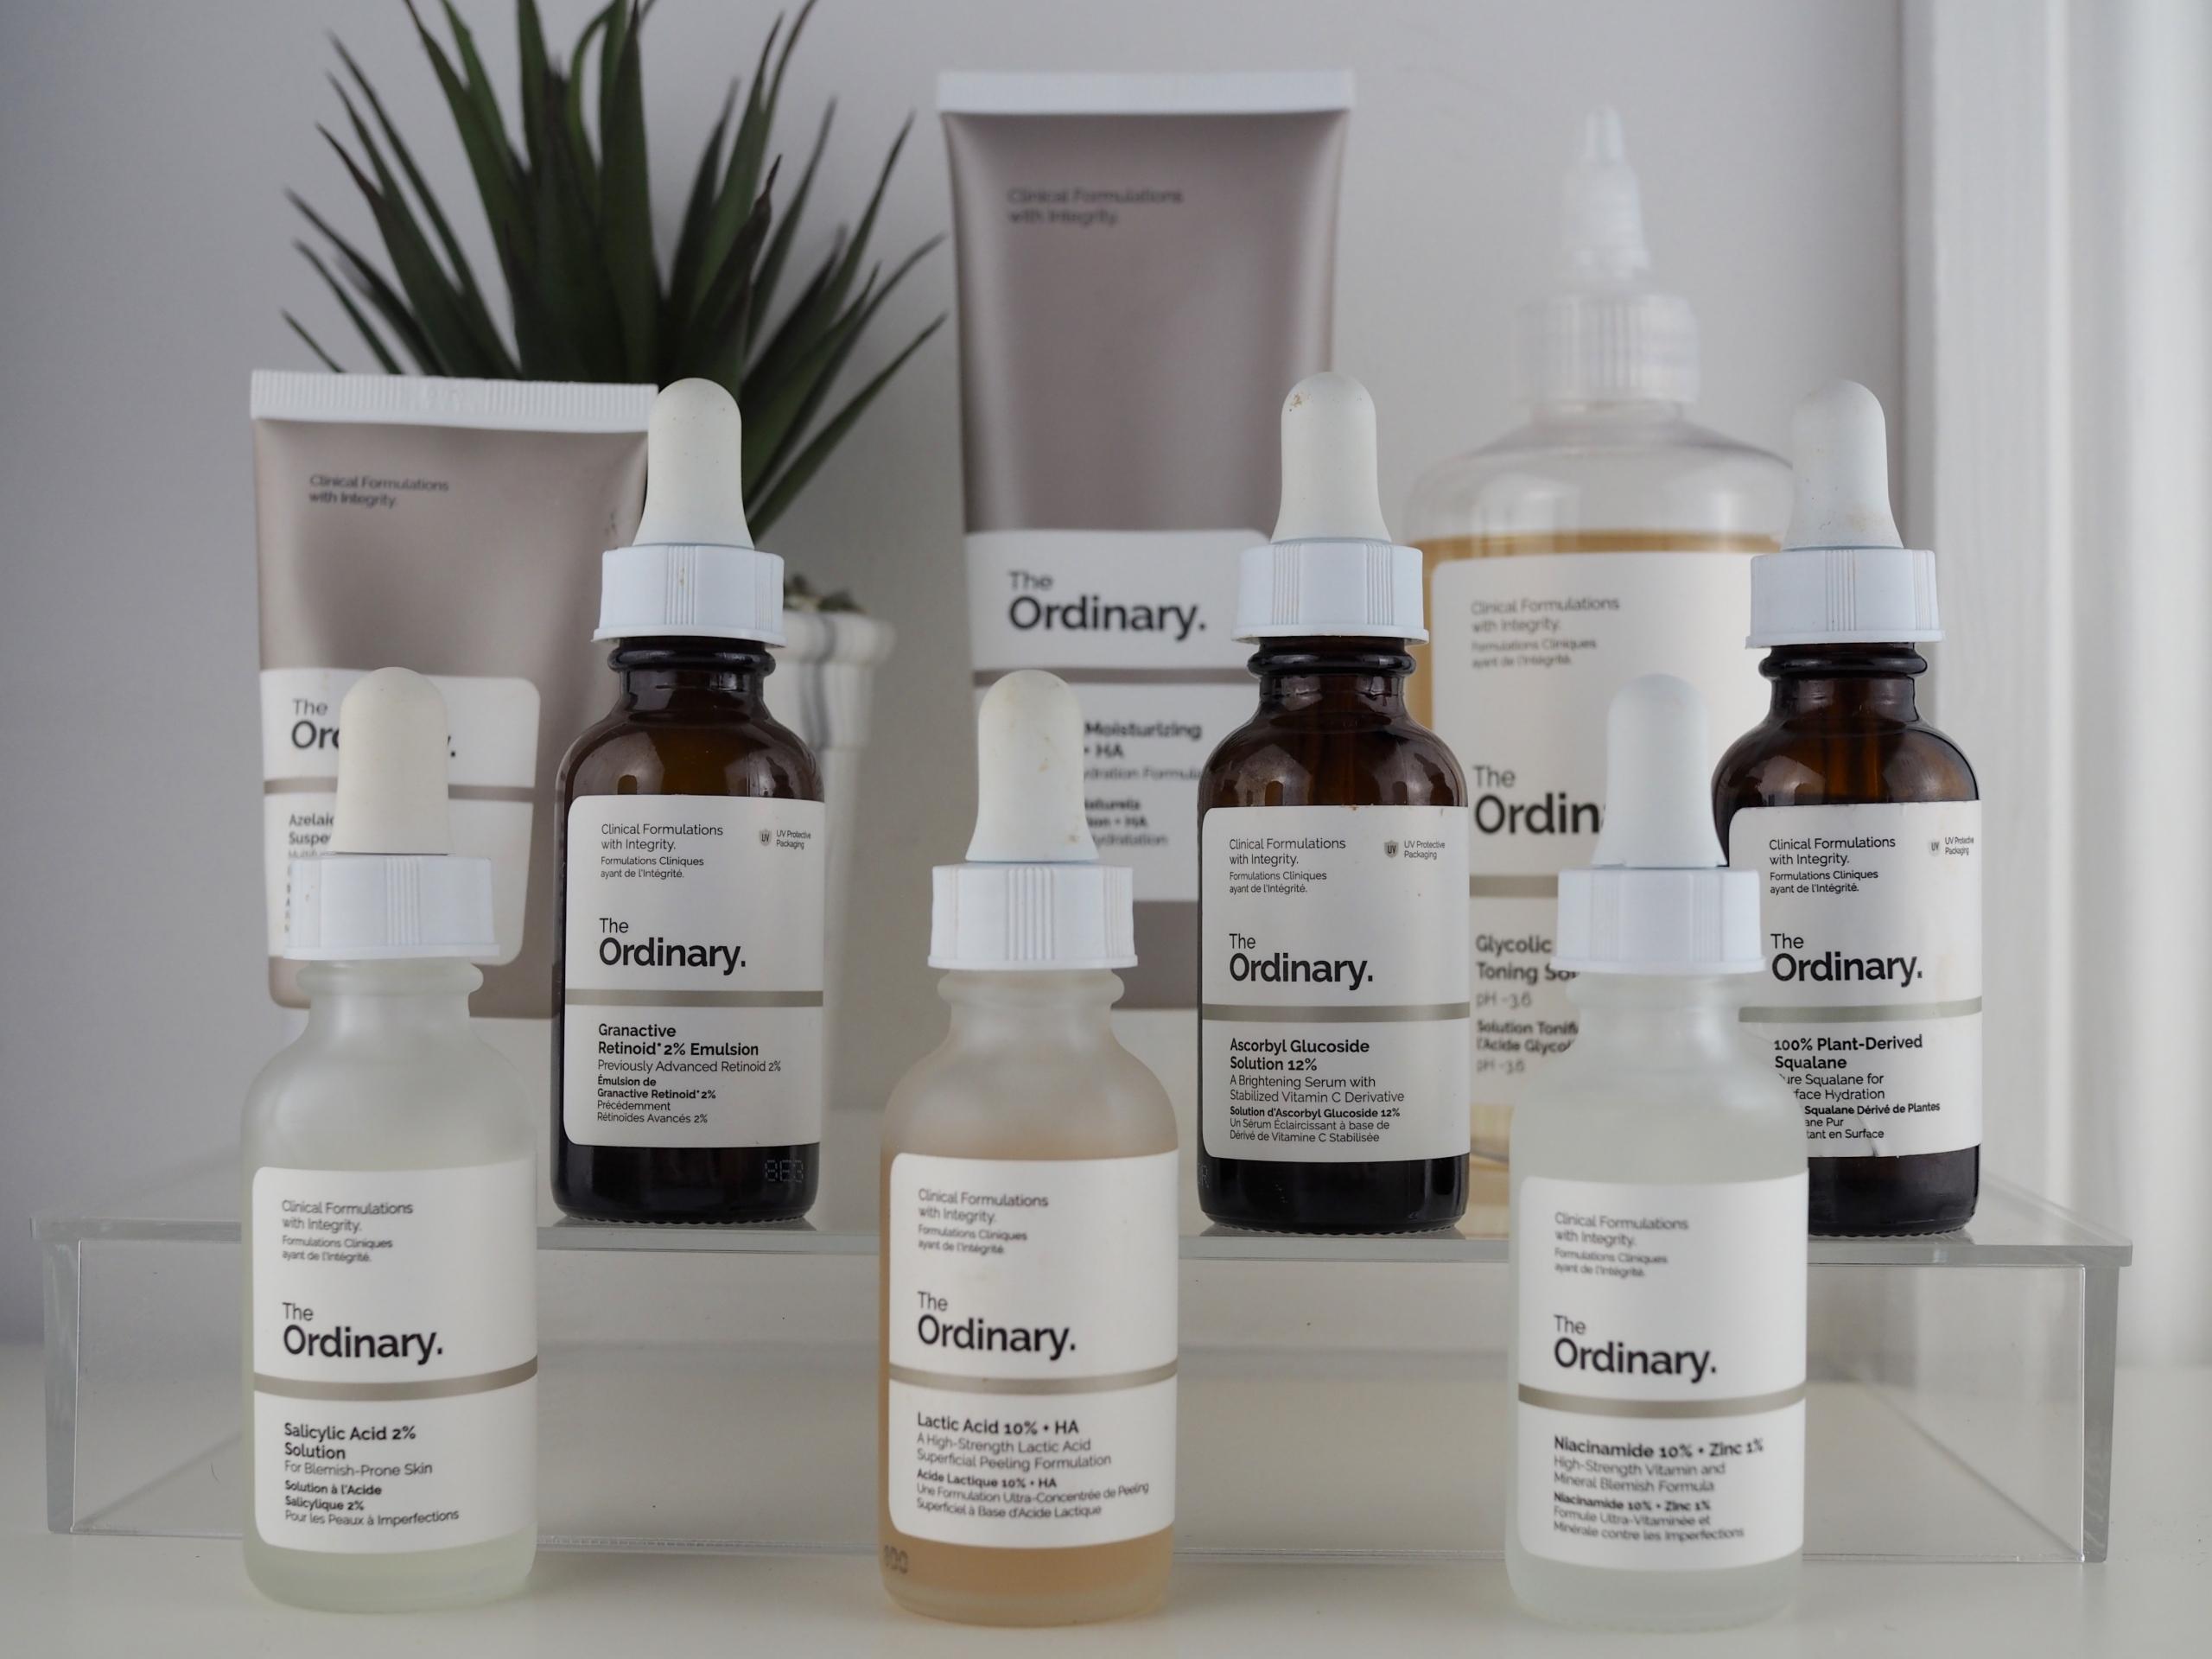 Honest review of the ordinary skincare